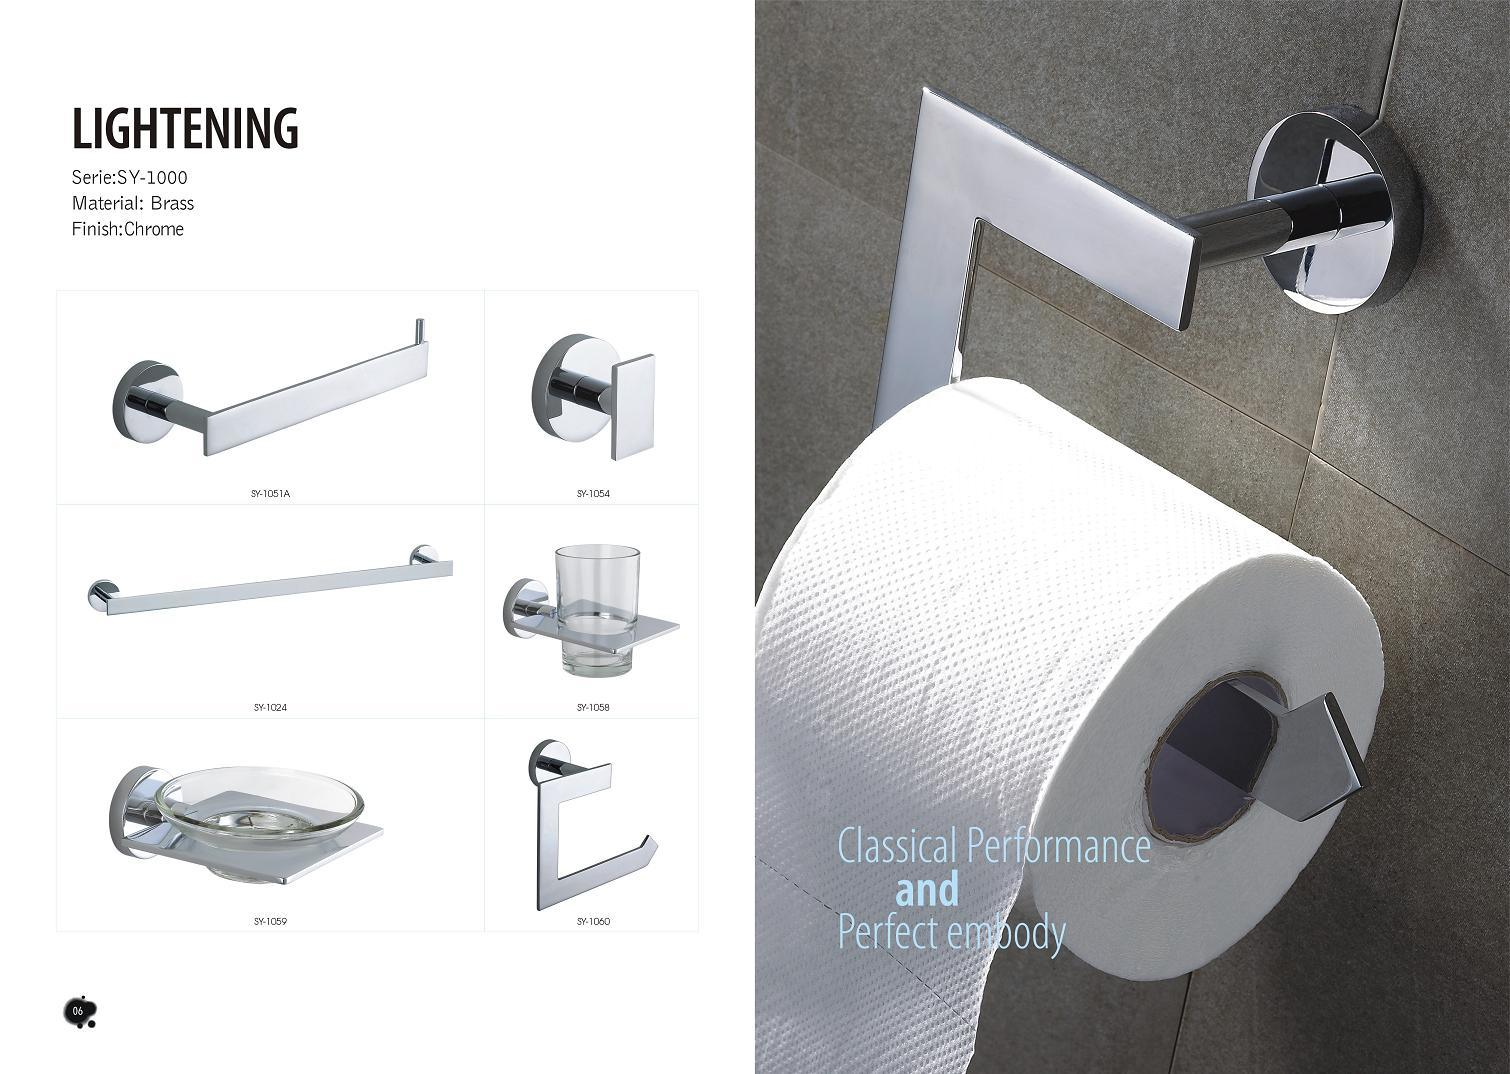 China Soyale Lightening Brass Chrome Bathroom Accessories Sy 1000   China Bathroom  Accessories, Bathroom Fitting